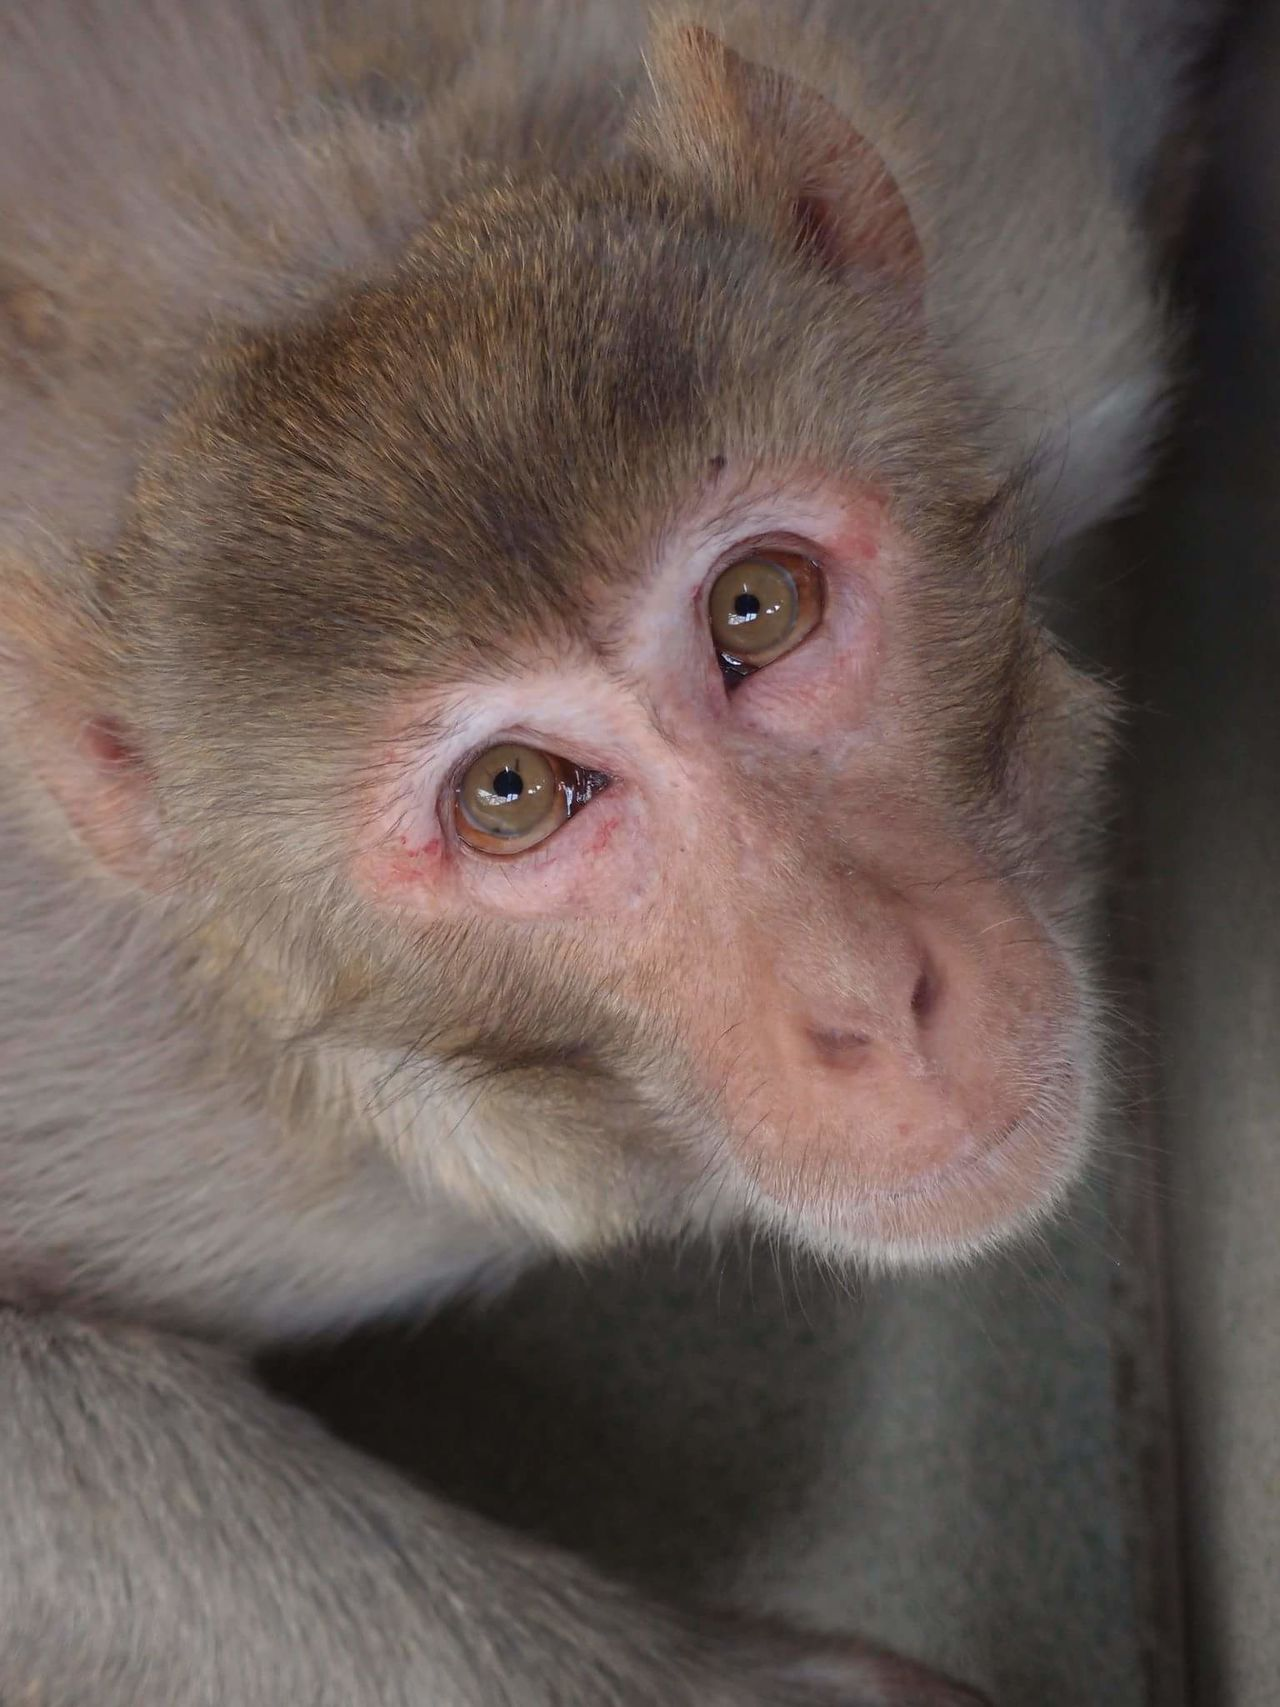 No Filter Monkey Travel Eyes Stare Lookingup Nature Looking At Camera Animal Themes One Animal Mammal No People Day